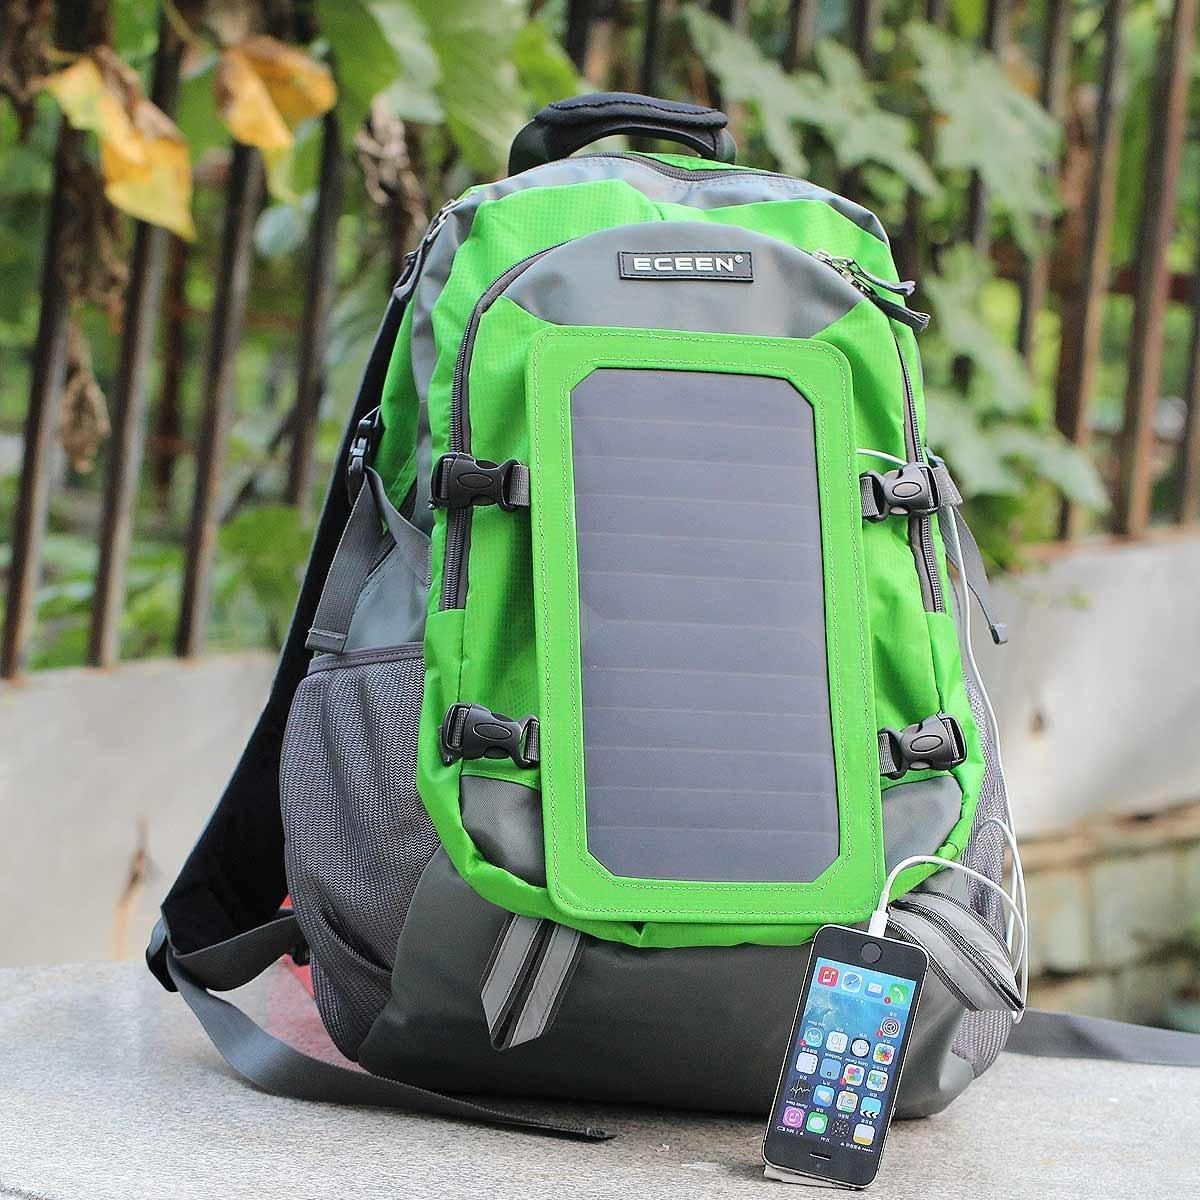 Eceen 174 7watts Solar Backpack Solar Panel Bag Poly